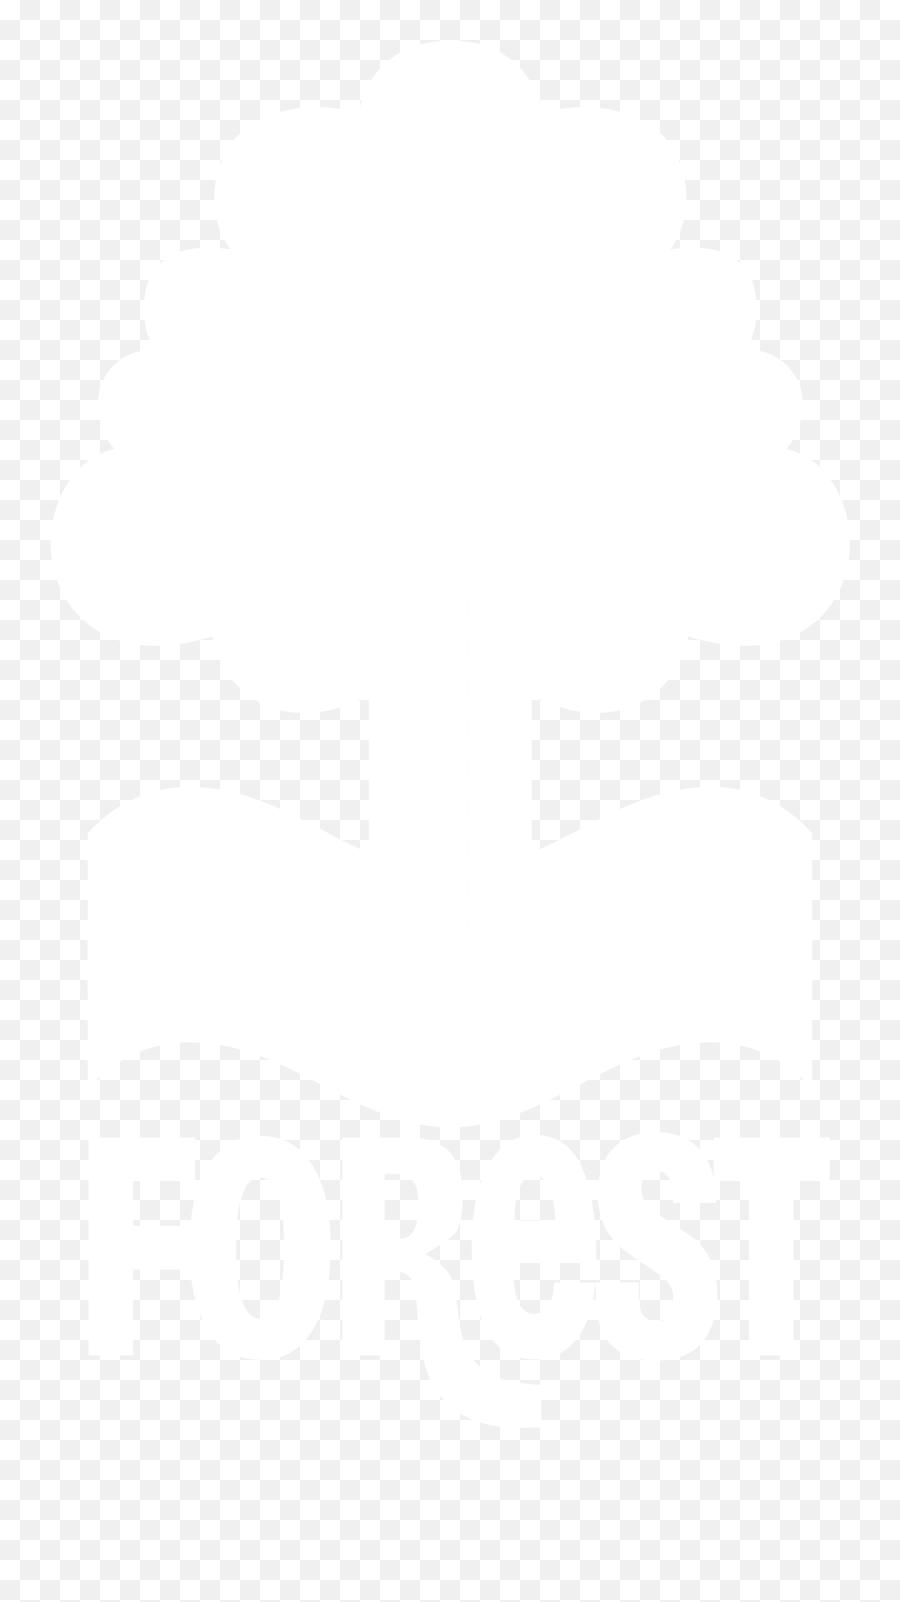 Download Nottingham Forest Fc Logo Black And White - Johns Nottingham Forest Logo Png Black,The Forest Png